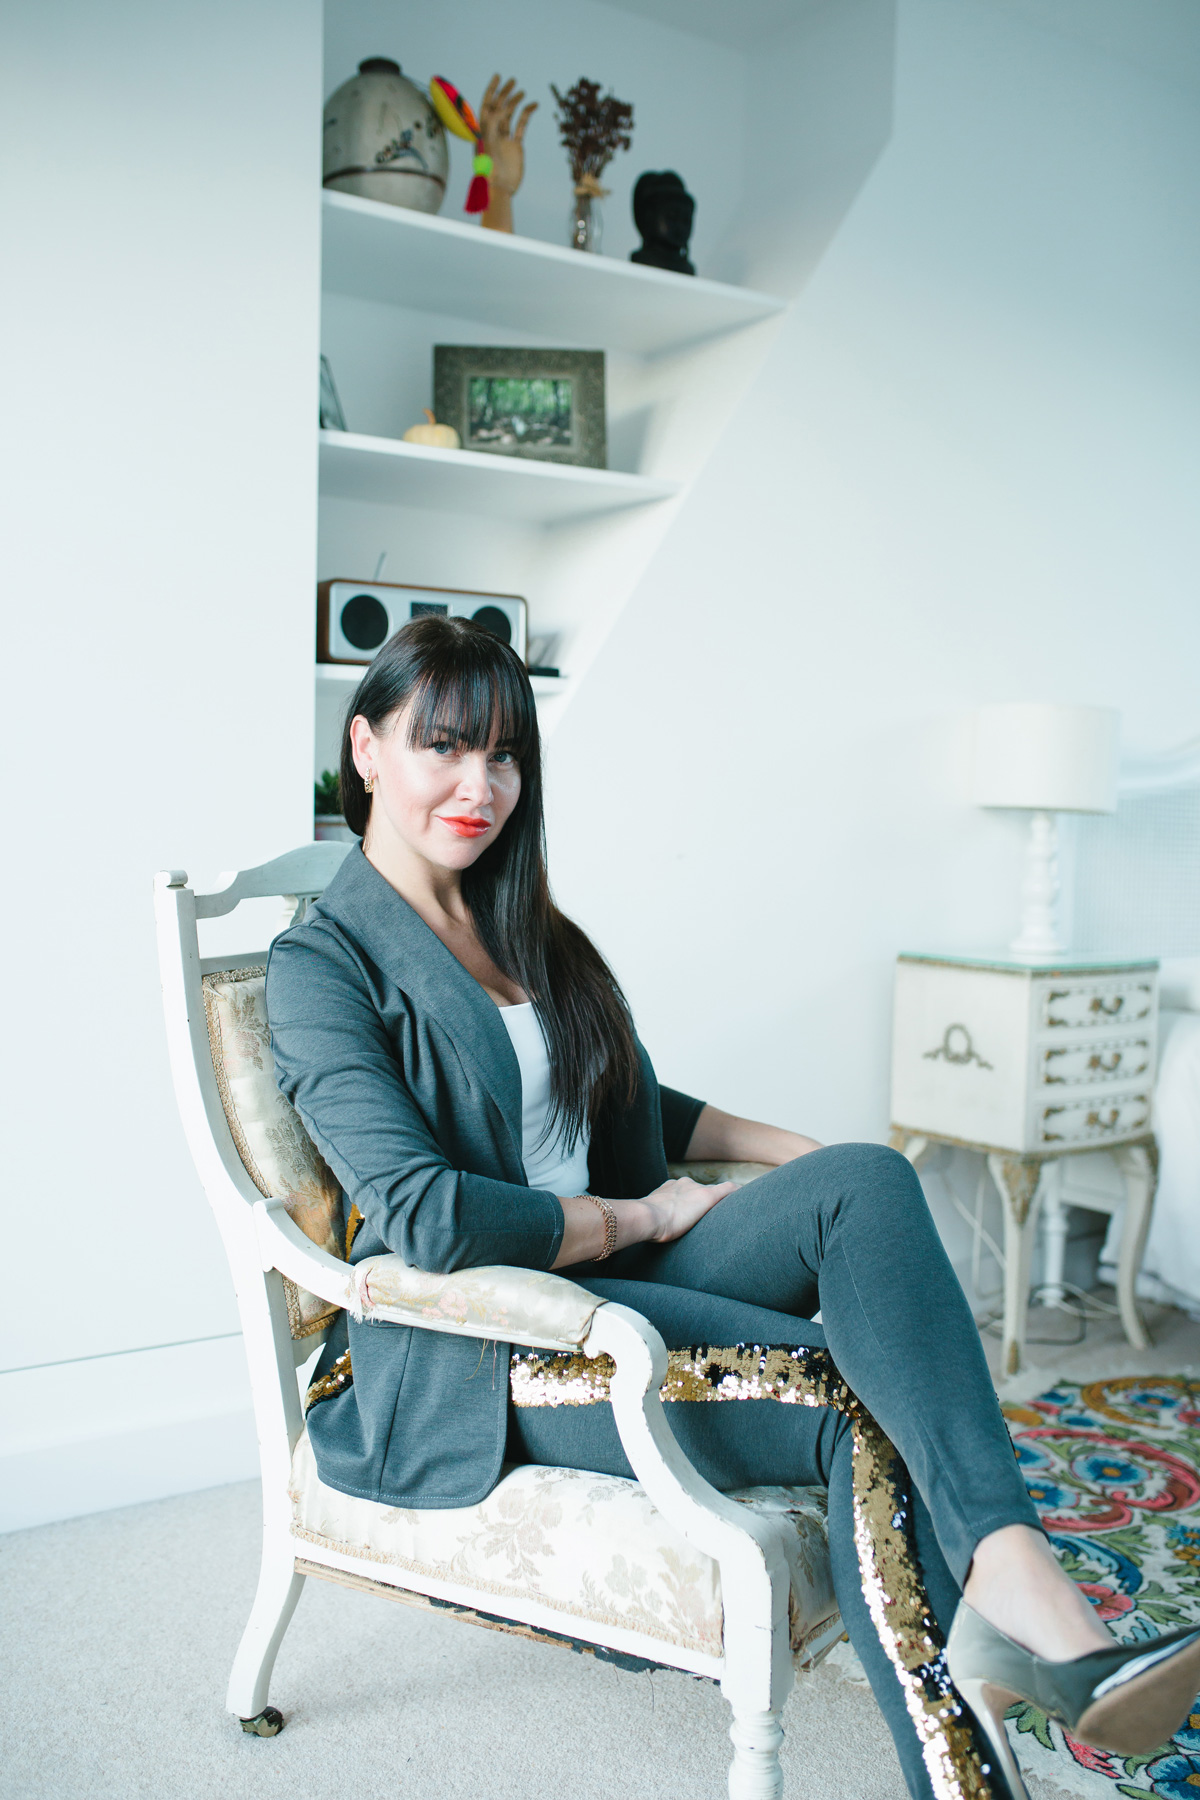 Martyna-Permanent-Make-up-Headshot-Sussex-Portrait-Photographer-VILCINSKAITE-PHOTO-3.jpg